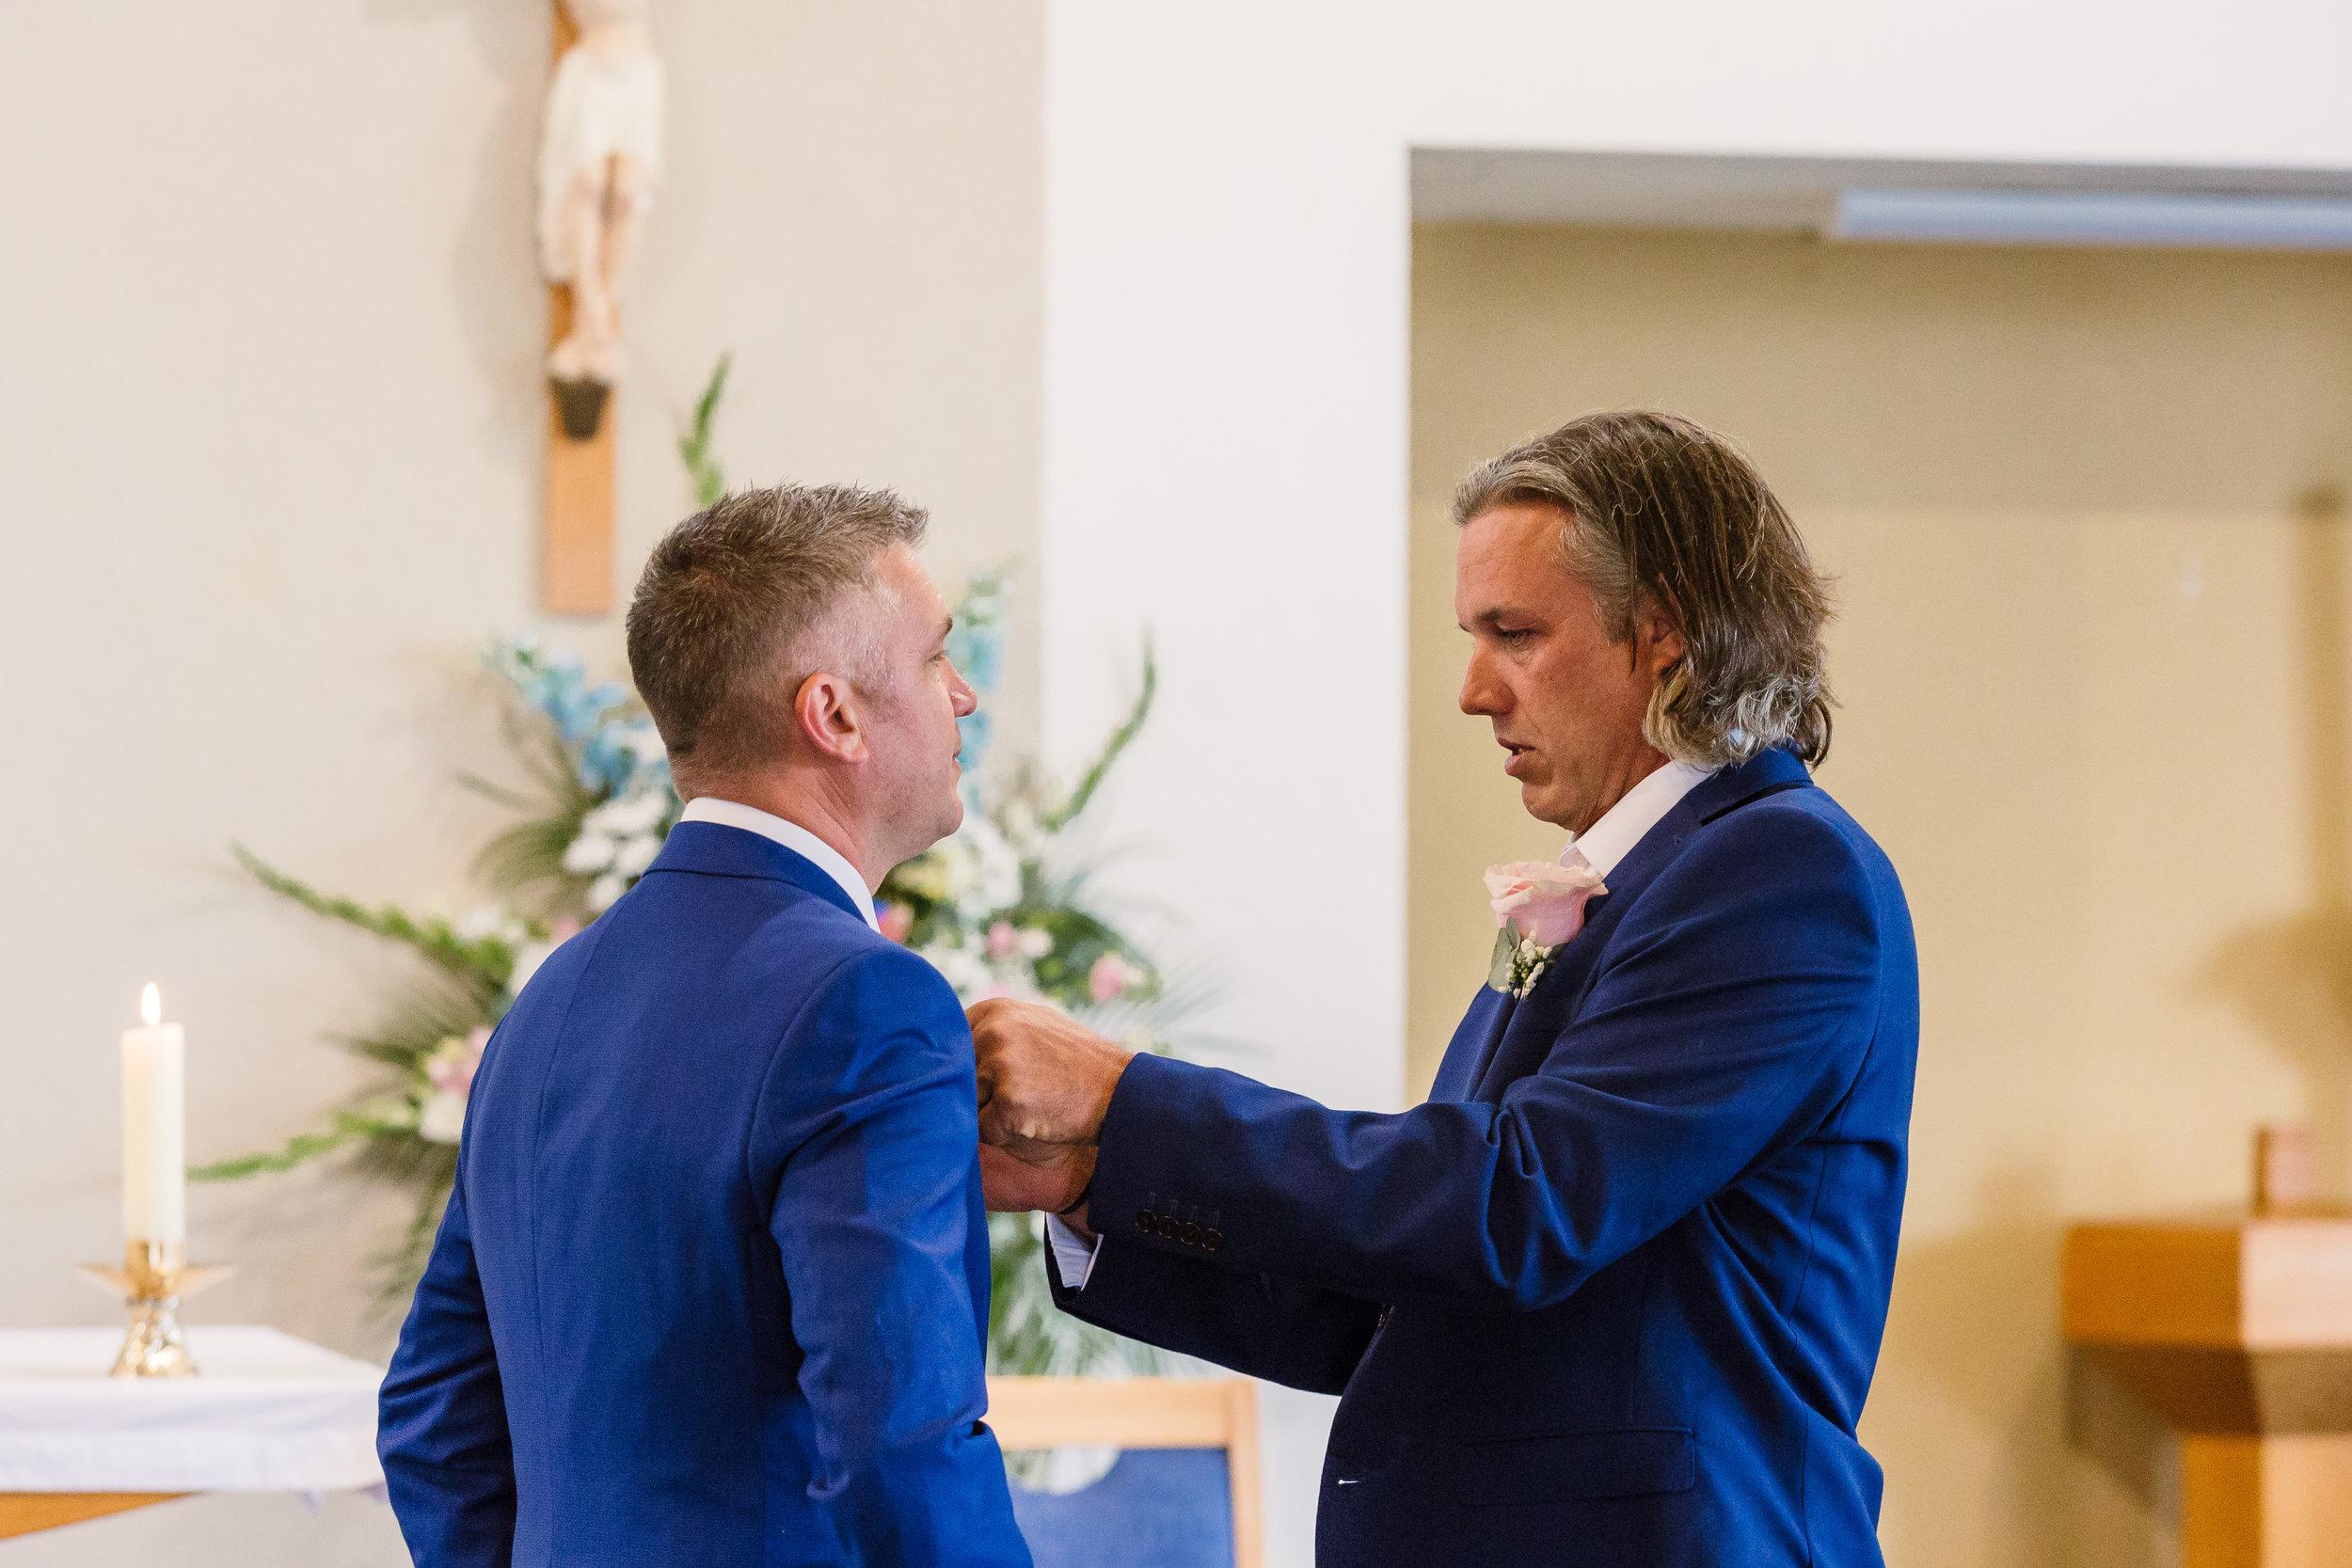 Sarah-Fishlock-Photography : Hampshire-wedding-photographer-hampshire : fleet-wedding-photographer-fleet : Meade-Hall-Wedding-Photographer : Meade-Hall-Wedding-Photos-393.jpg